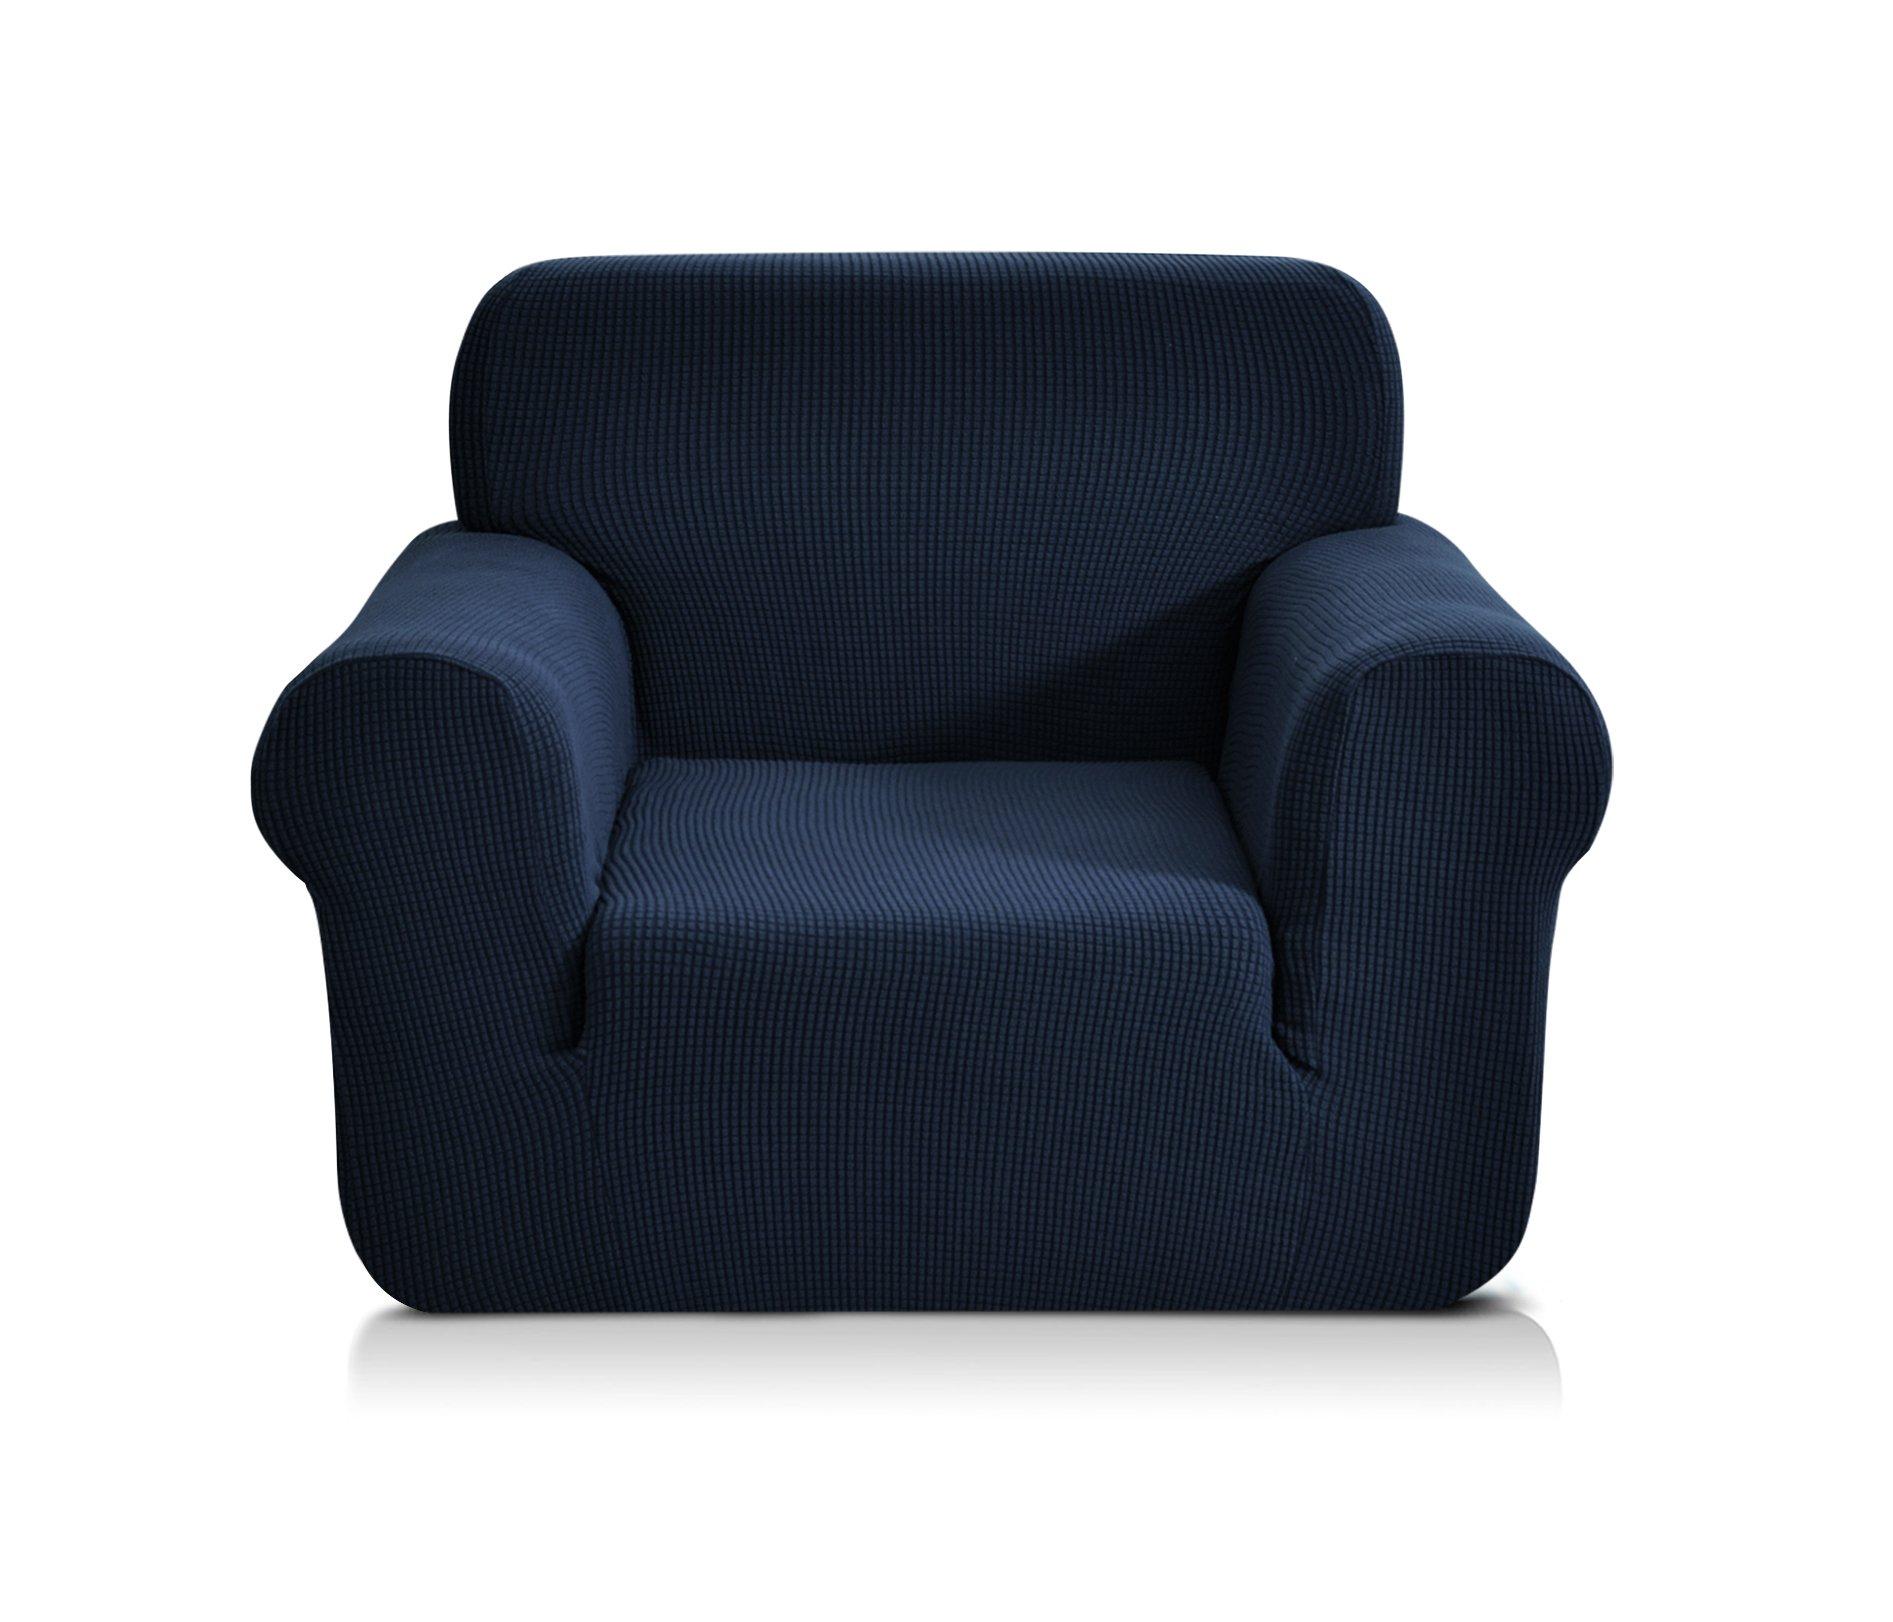 chun yi 1 pi ce jacquard housse de canap extensible rev tement de canap inspid co. Black Bedroom Furniture Sets. Home Design Ideas